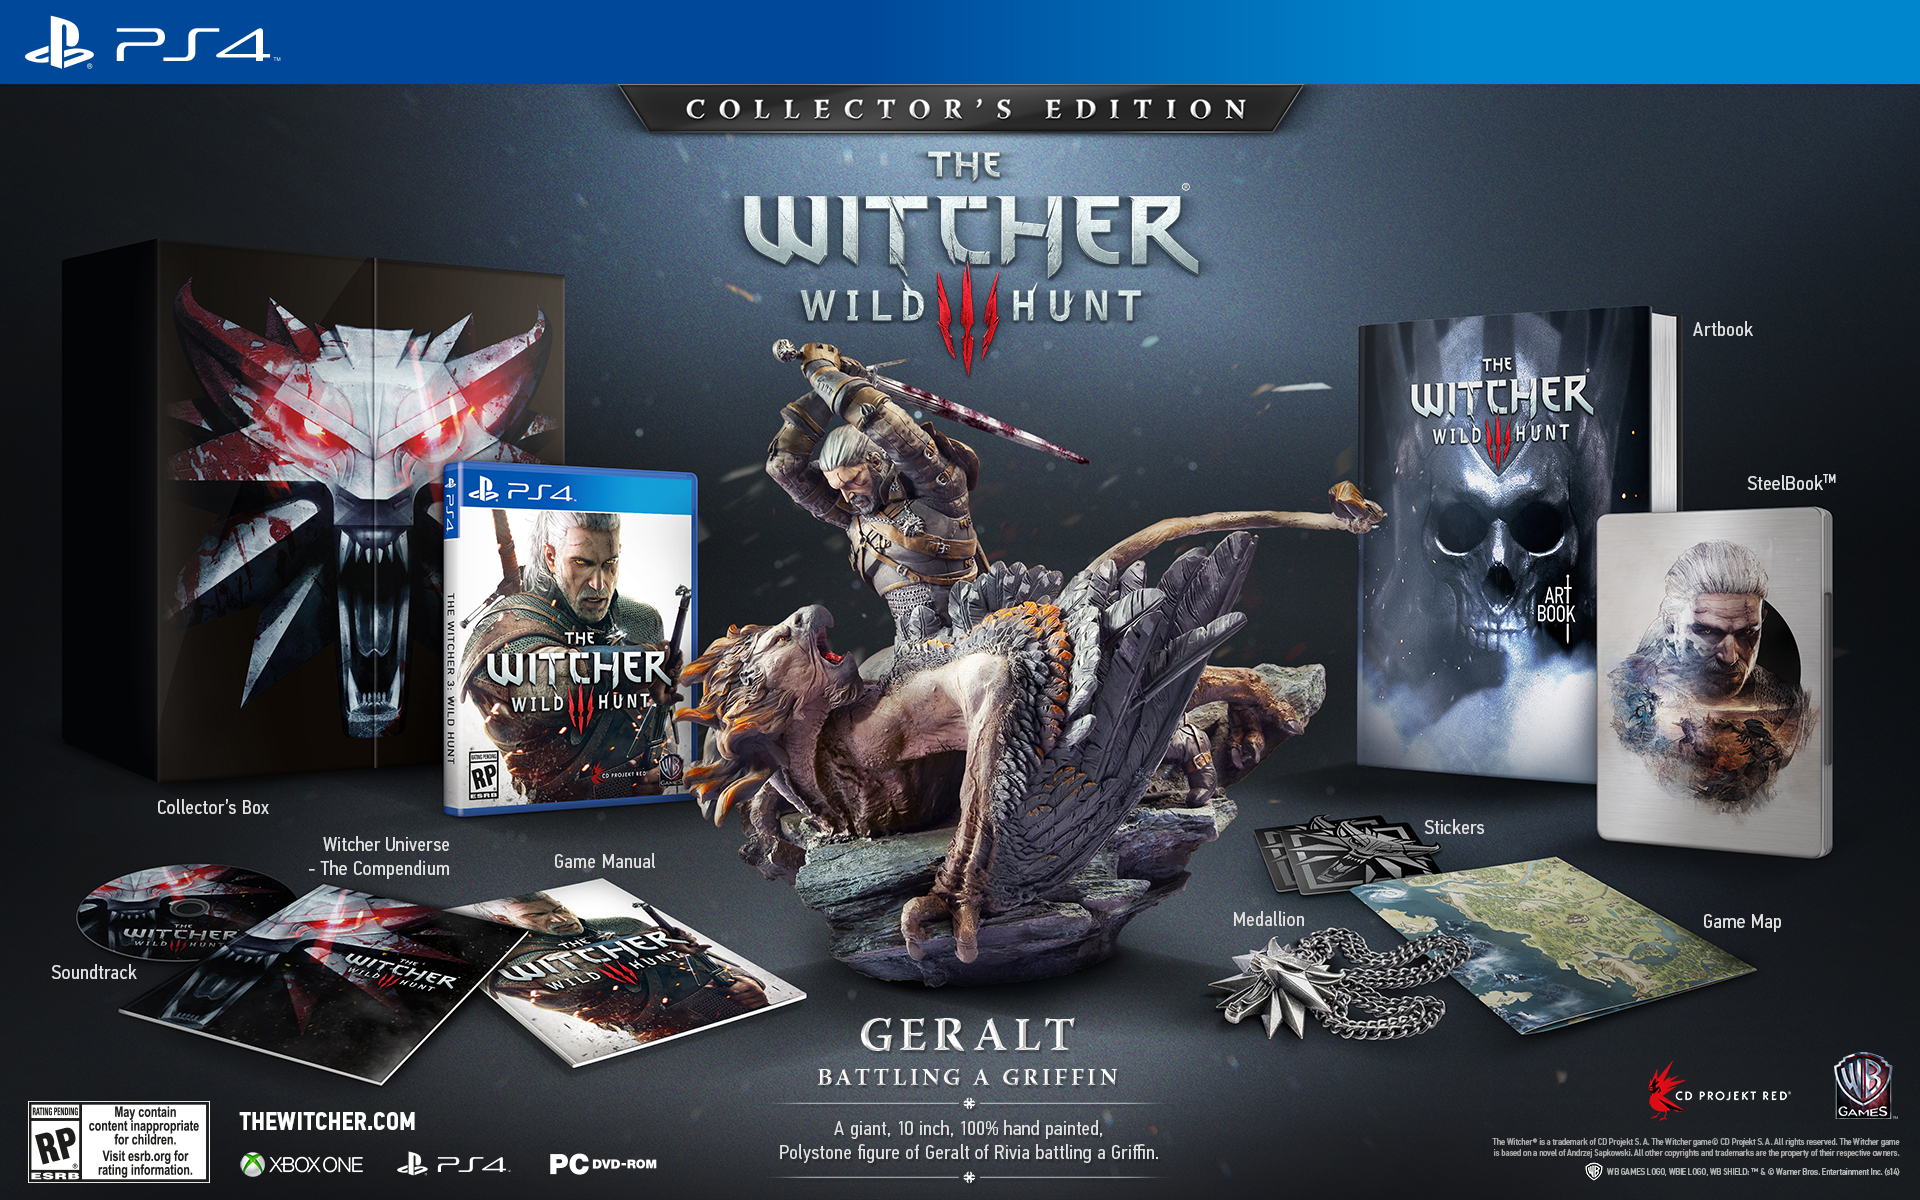 Witcher 4 release date in Australia